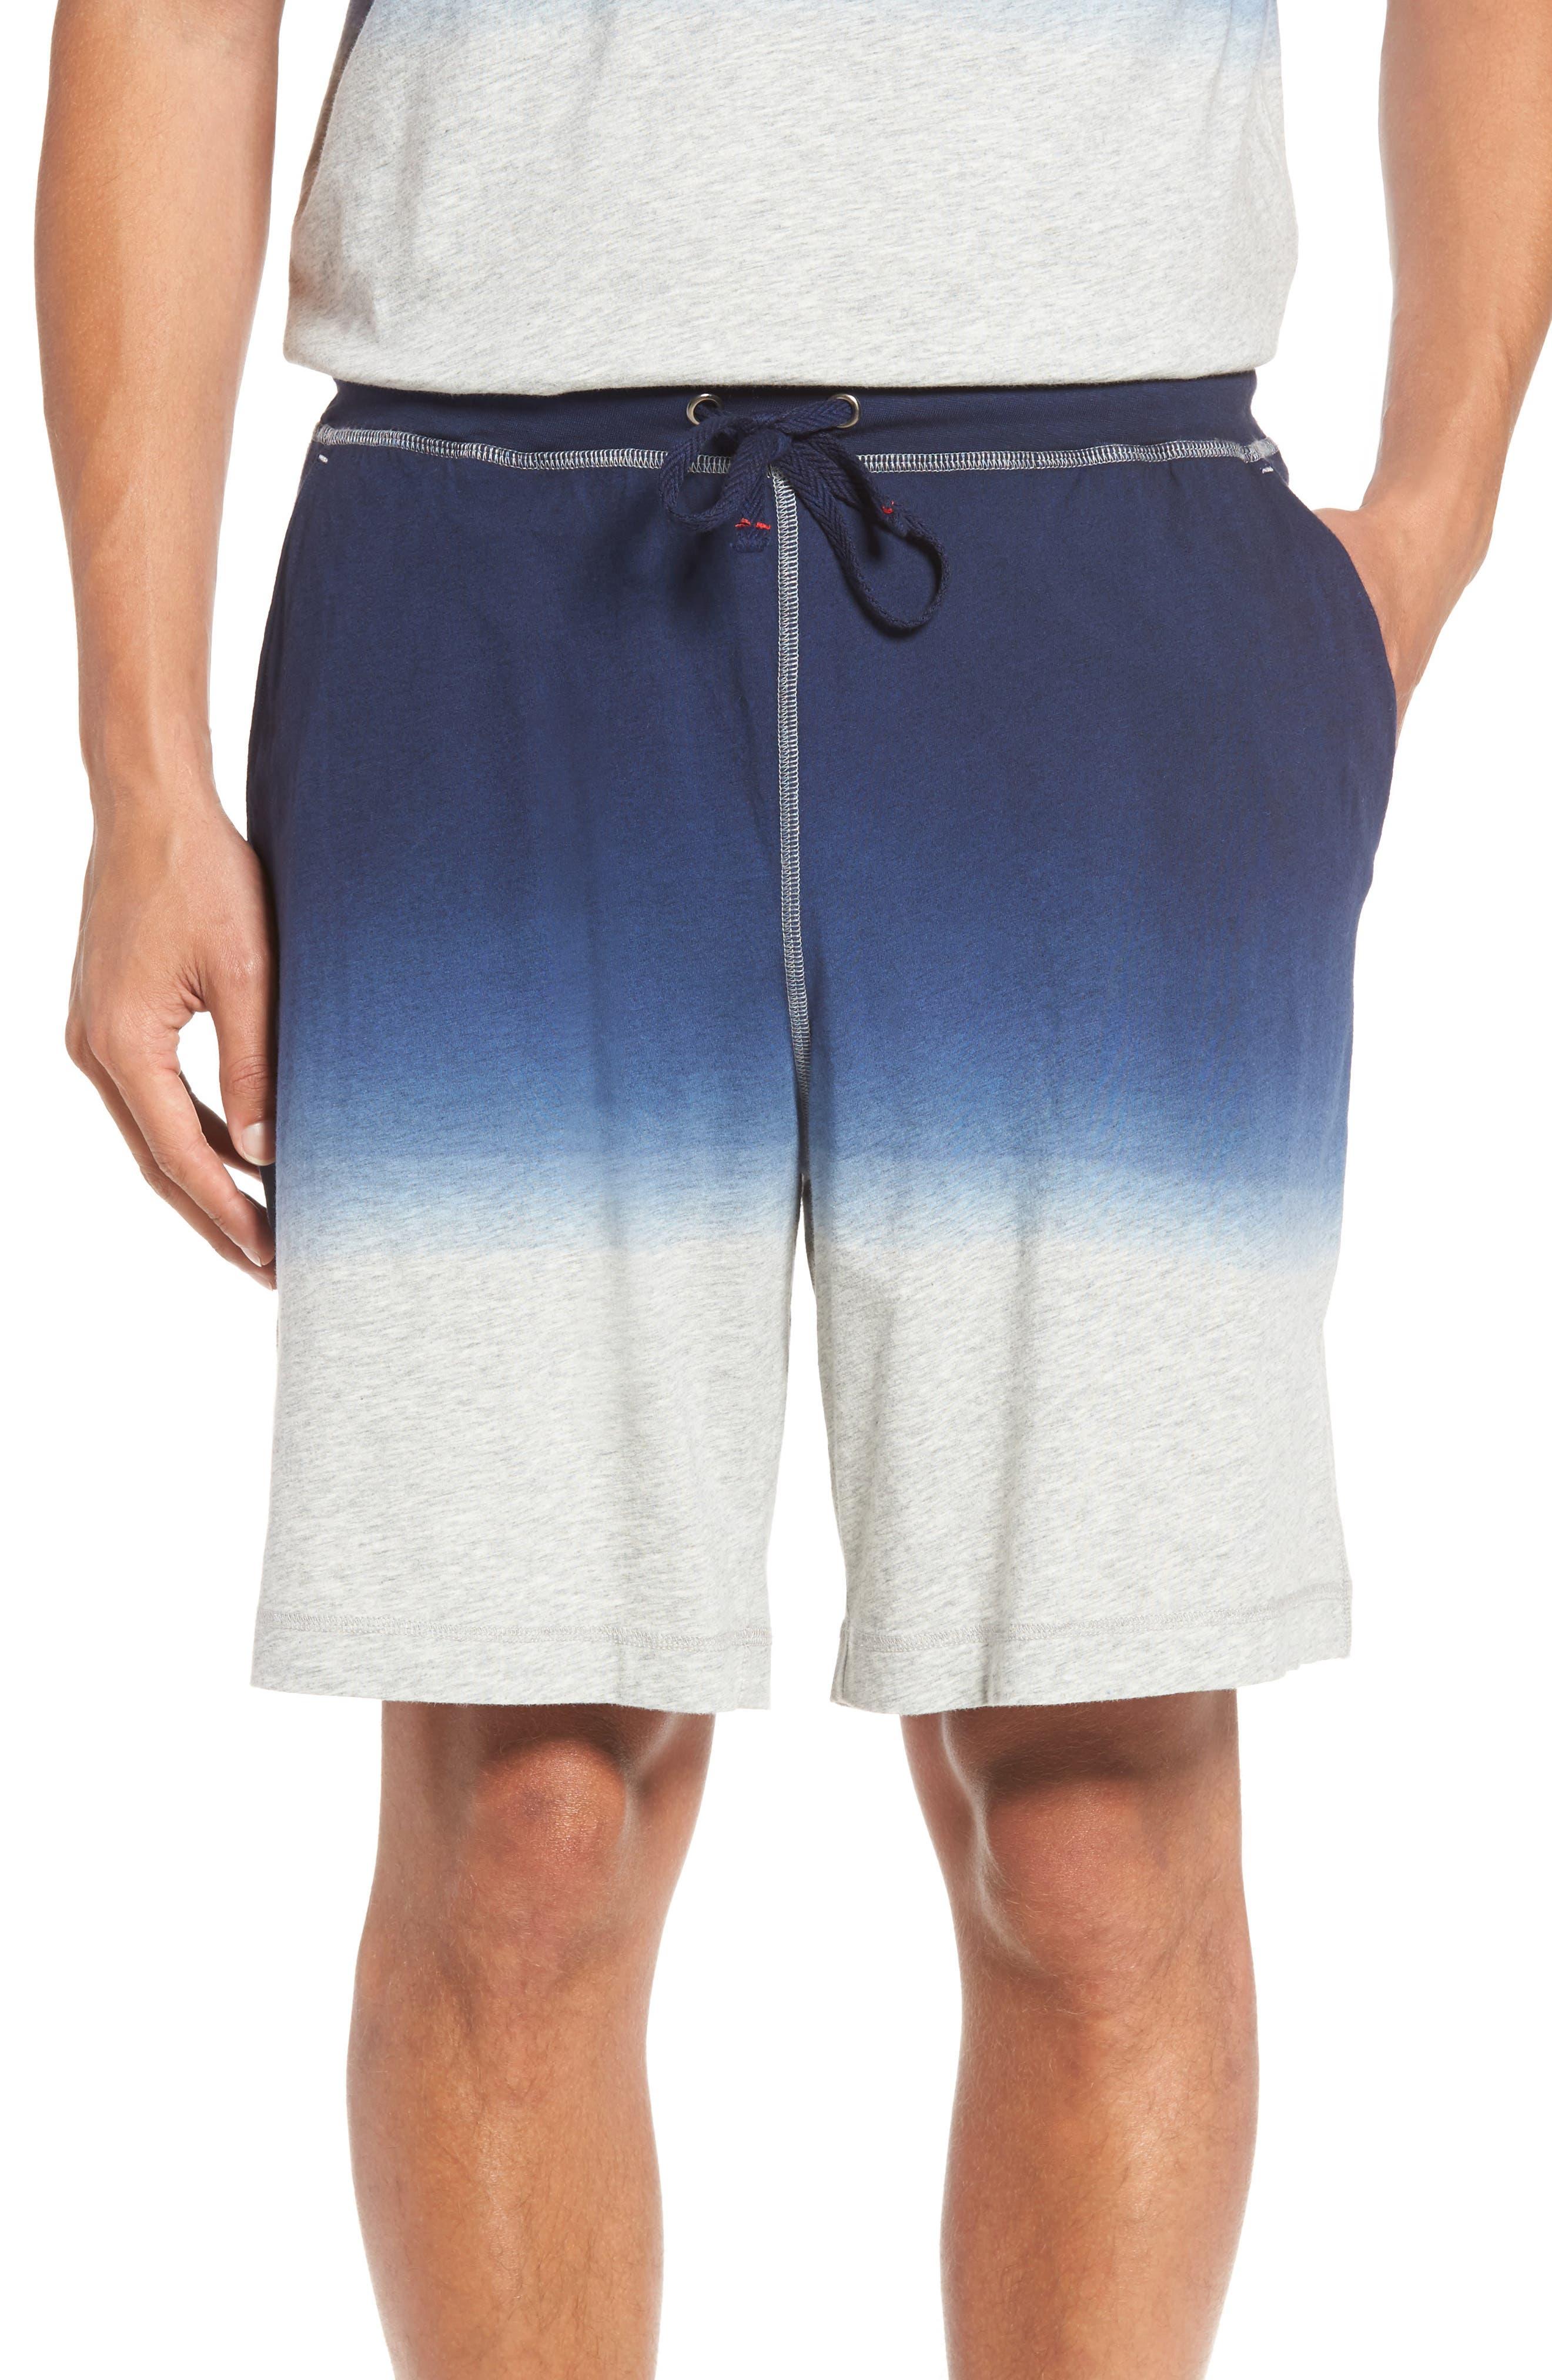 Dip Dye Lounge Shorts,                             Main thumbnail 1, color,                             410